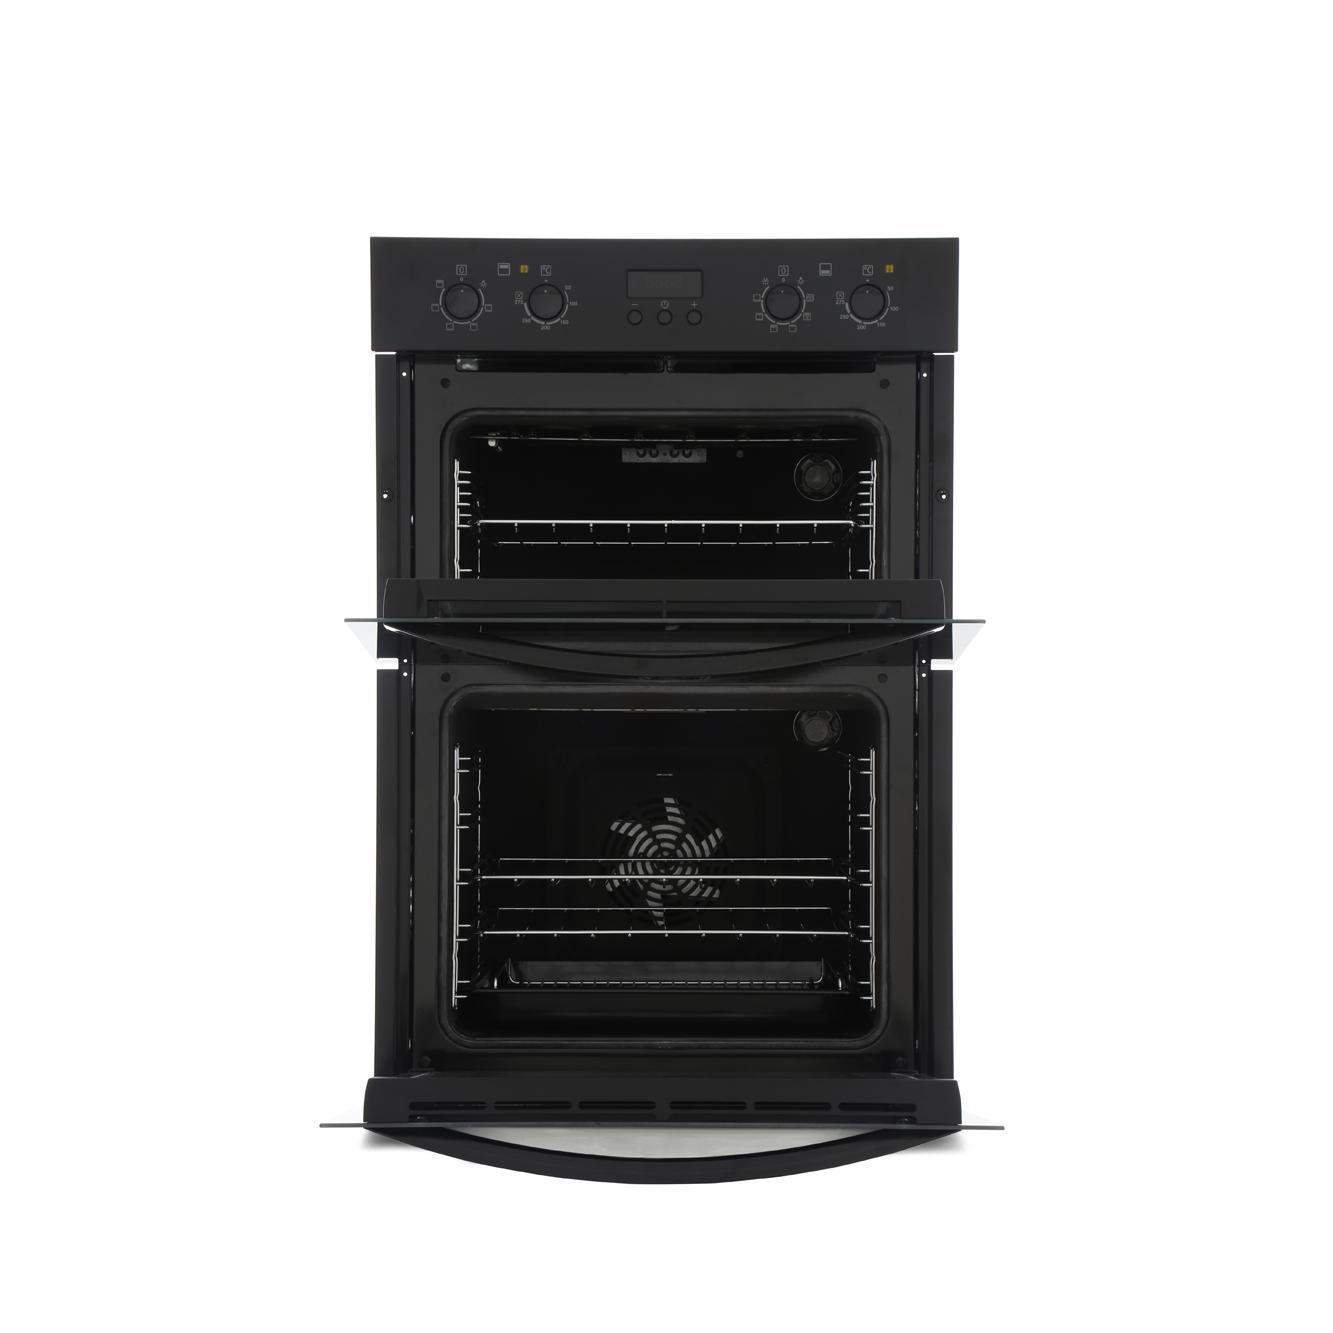 Buy Zanussi Zod35712bk Double Built In Electric Oven